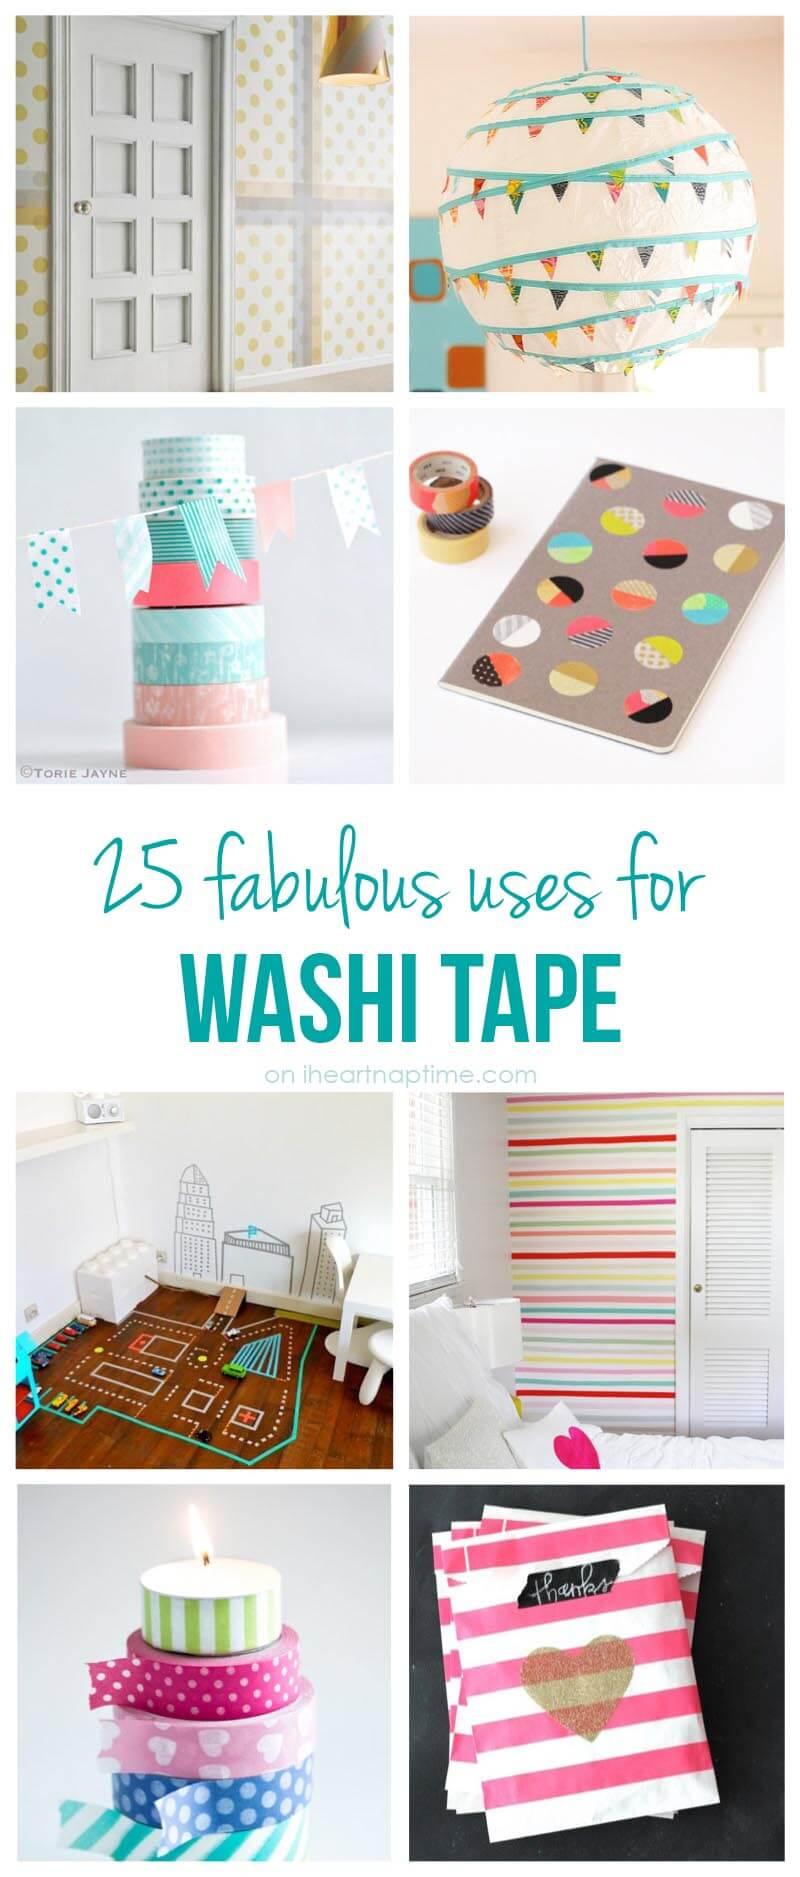 25 fabulous uses for washi tape